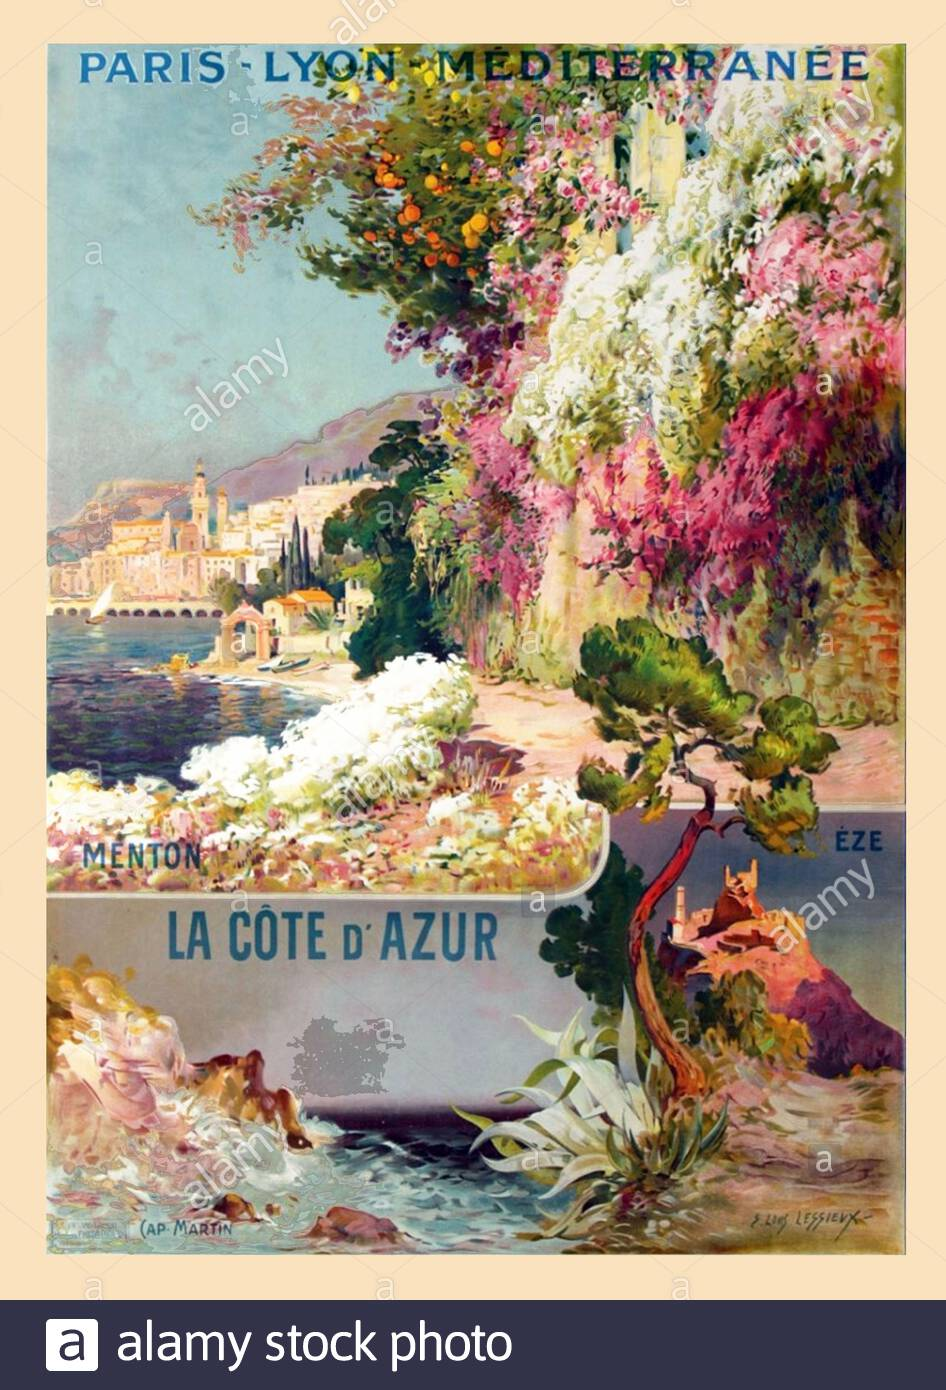 French Travel A3 Print Mediterranee Cote D/' Azur Art Poster Lyon Paris